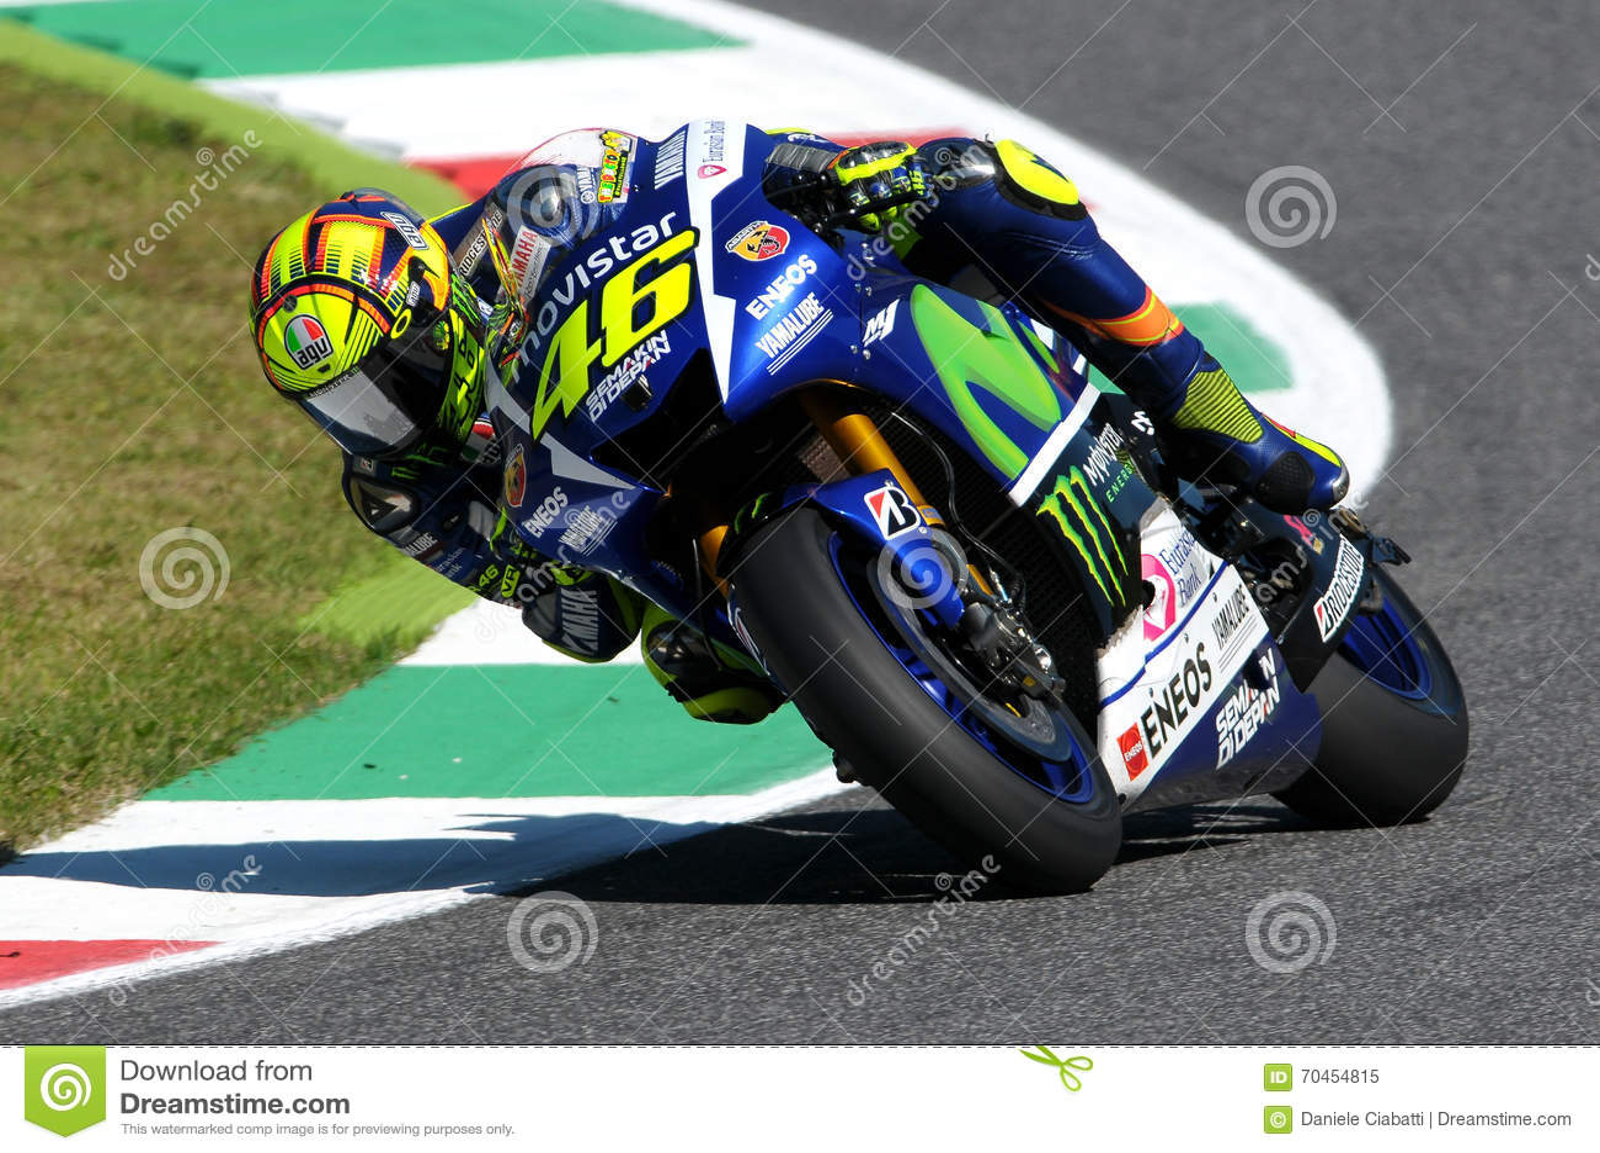 MOTOGP 2015, Valentino Rossi Editorial Image | CartoonDealer.com #53684128